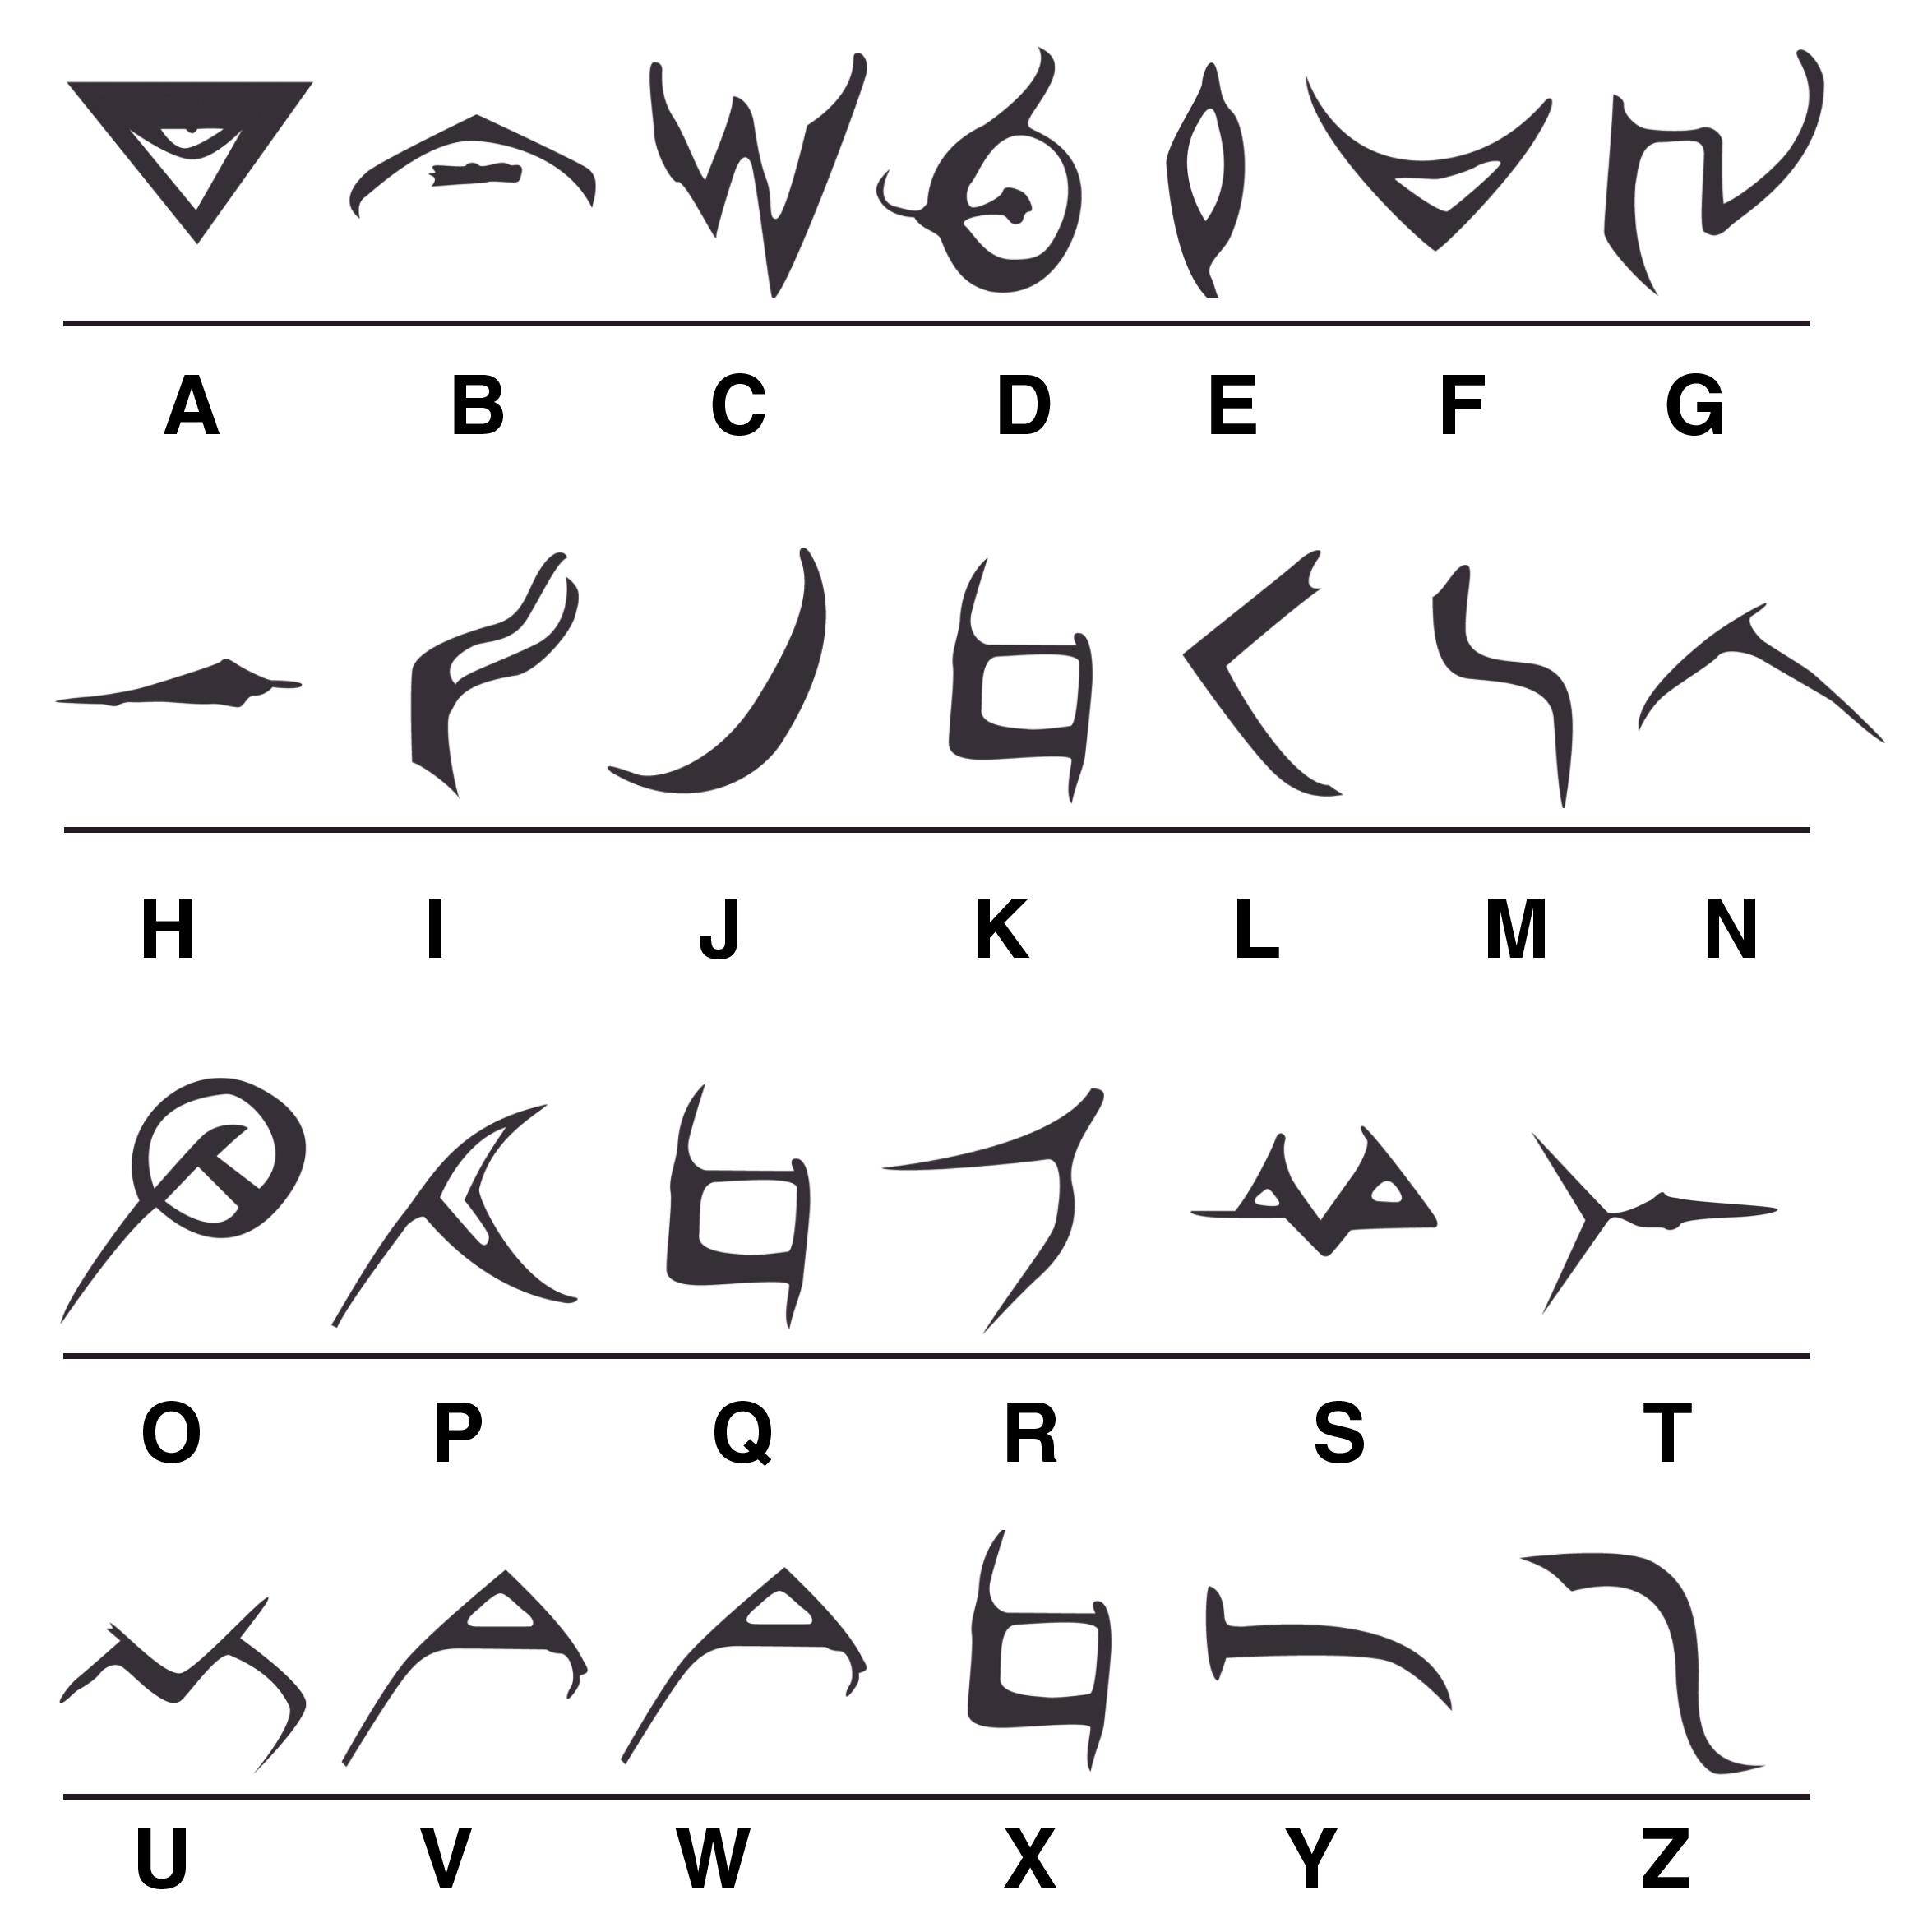 Shadowlanguage font by Tussa